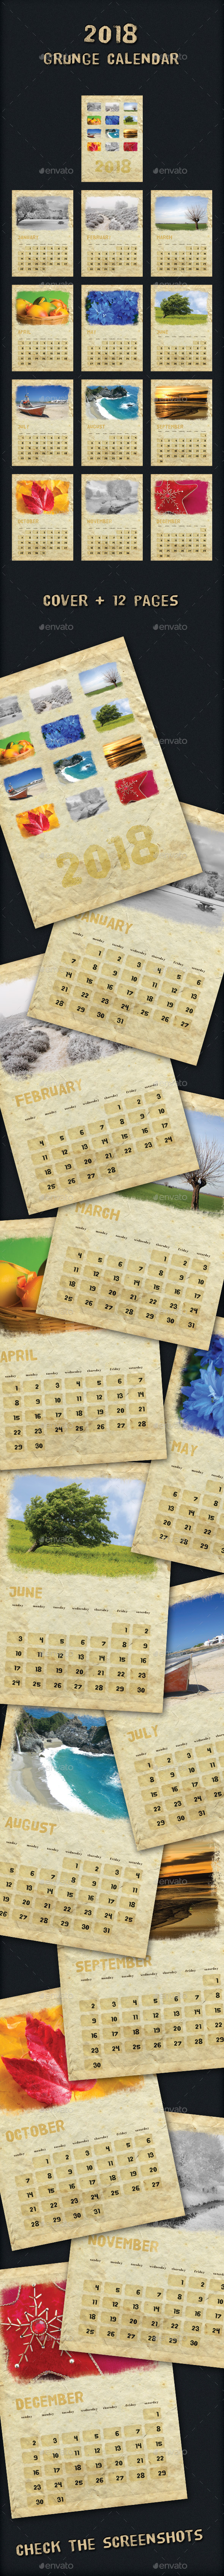 2018 Grunge Calendar - Calendars Stationery